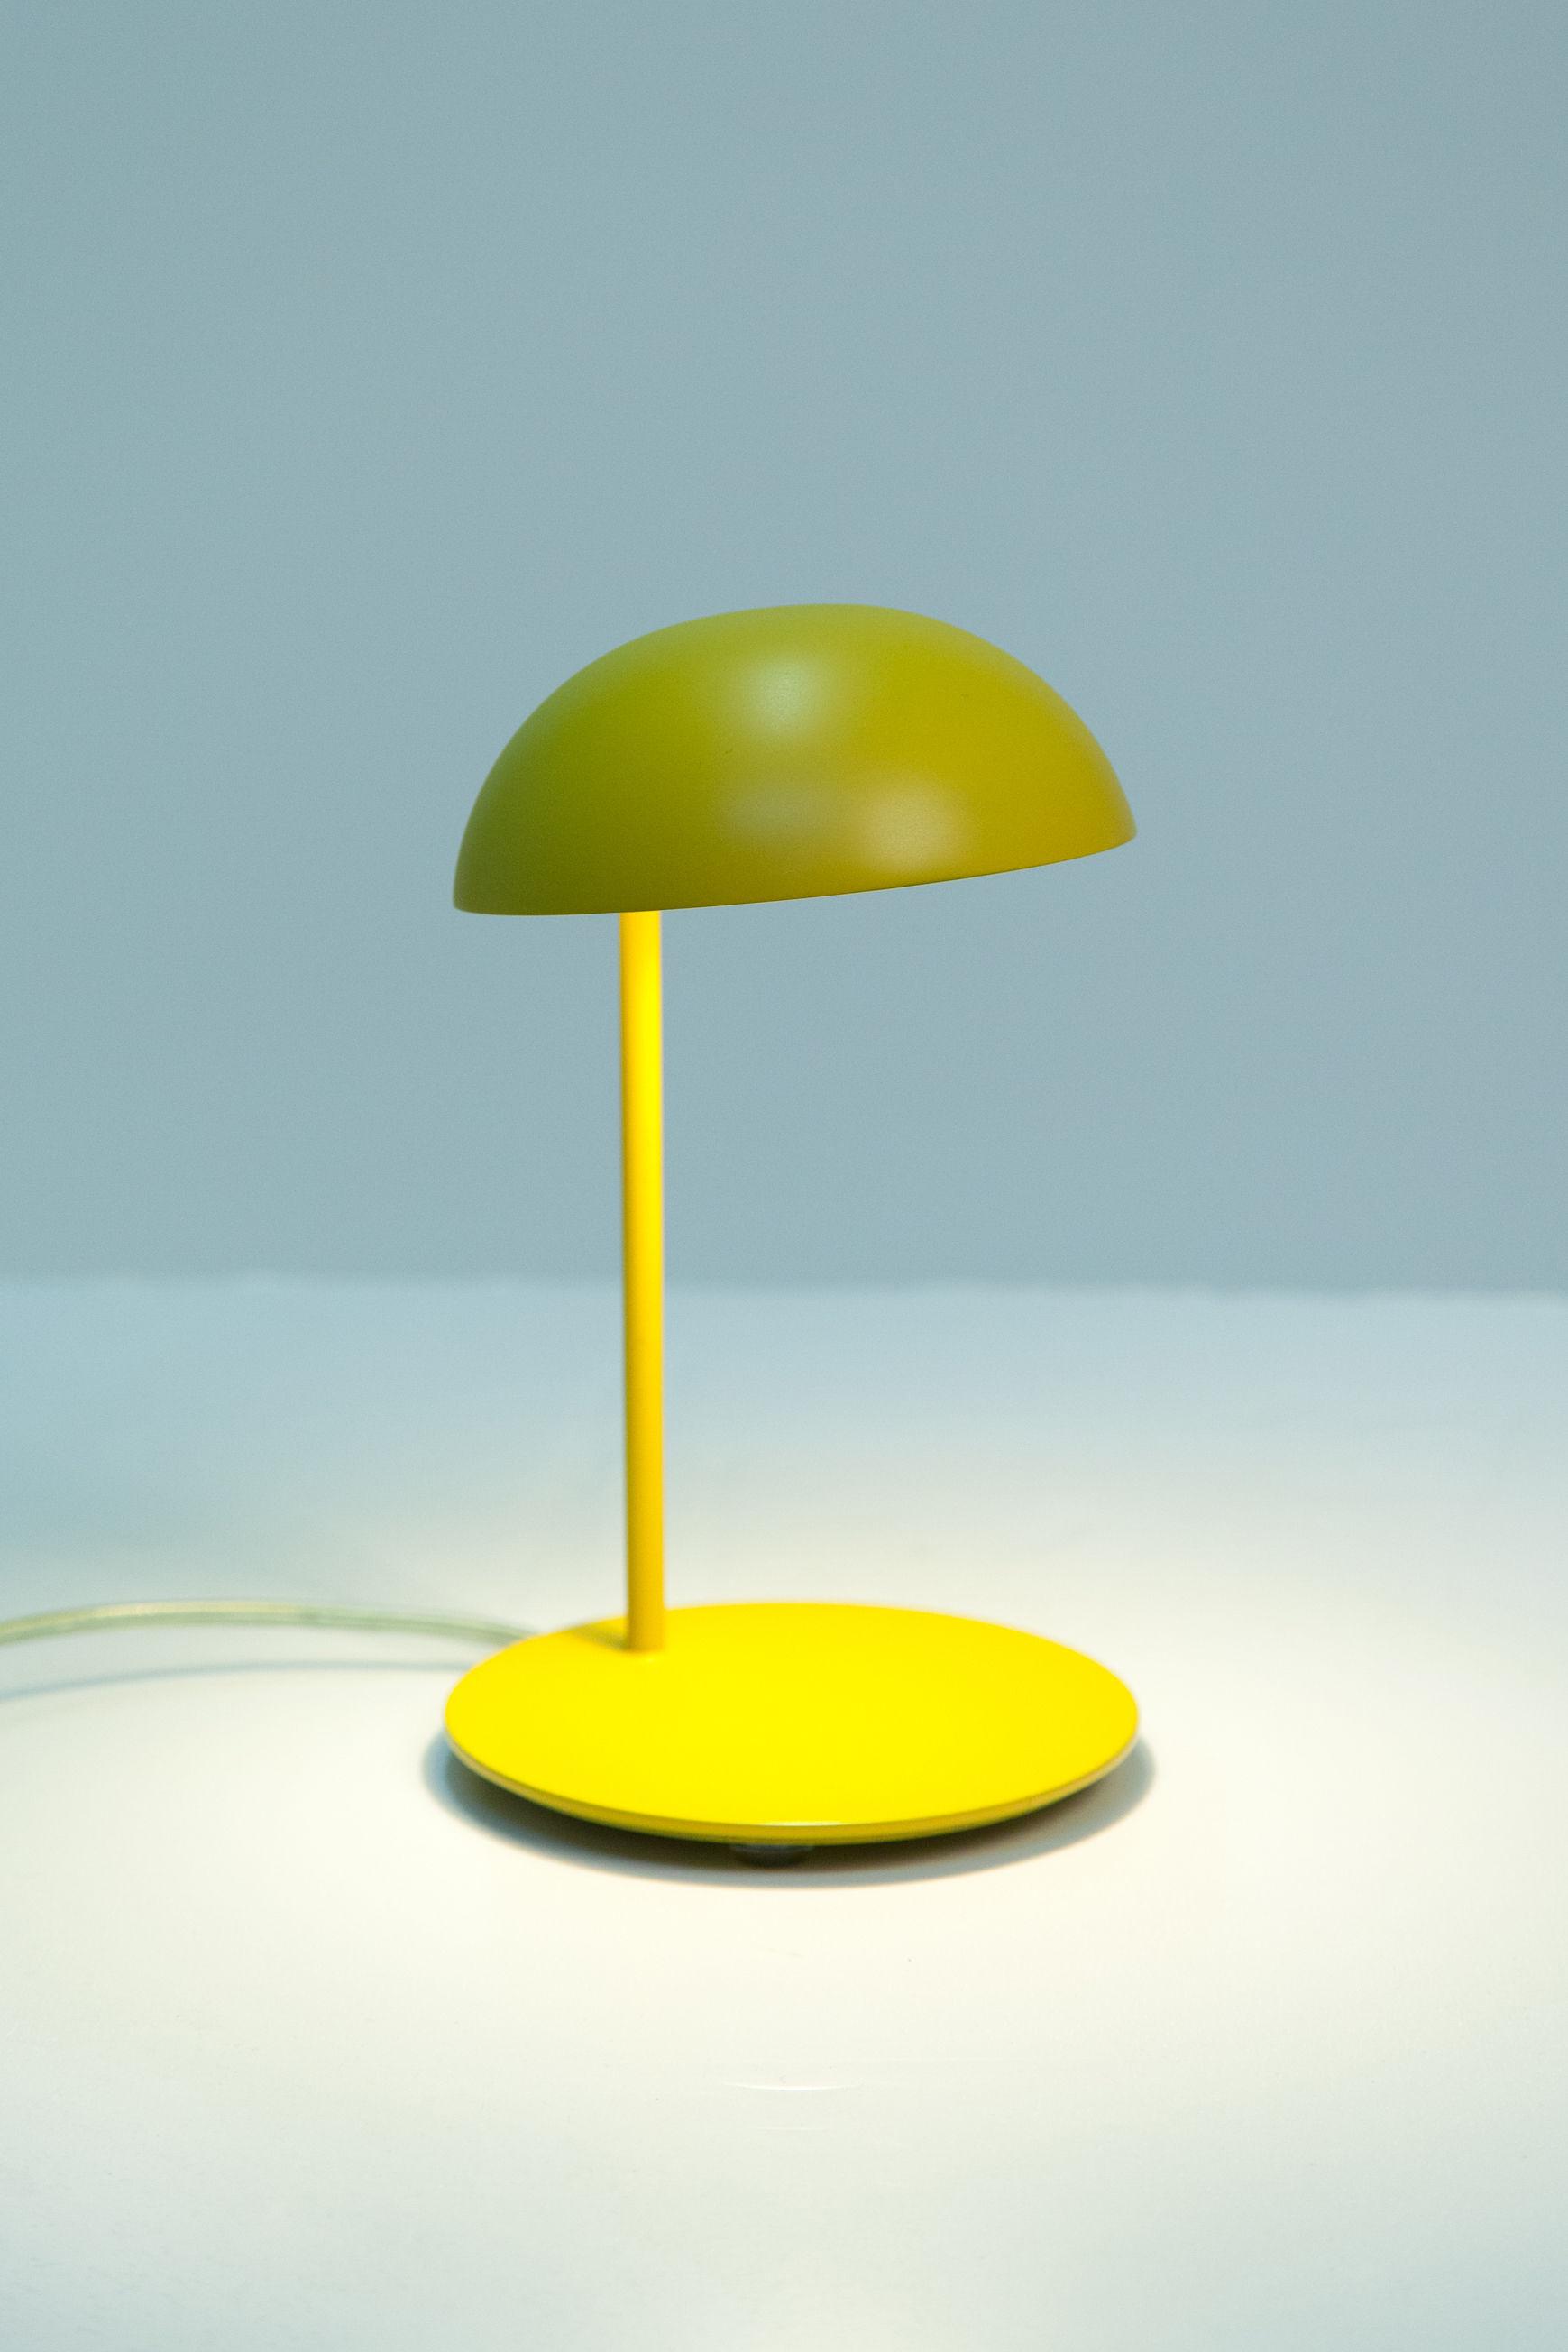 lampe de table pokko led jaune gallery s bensimon. Black Bedroom Furniture Sets. Home Design Ideas